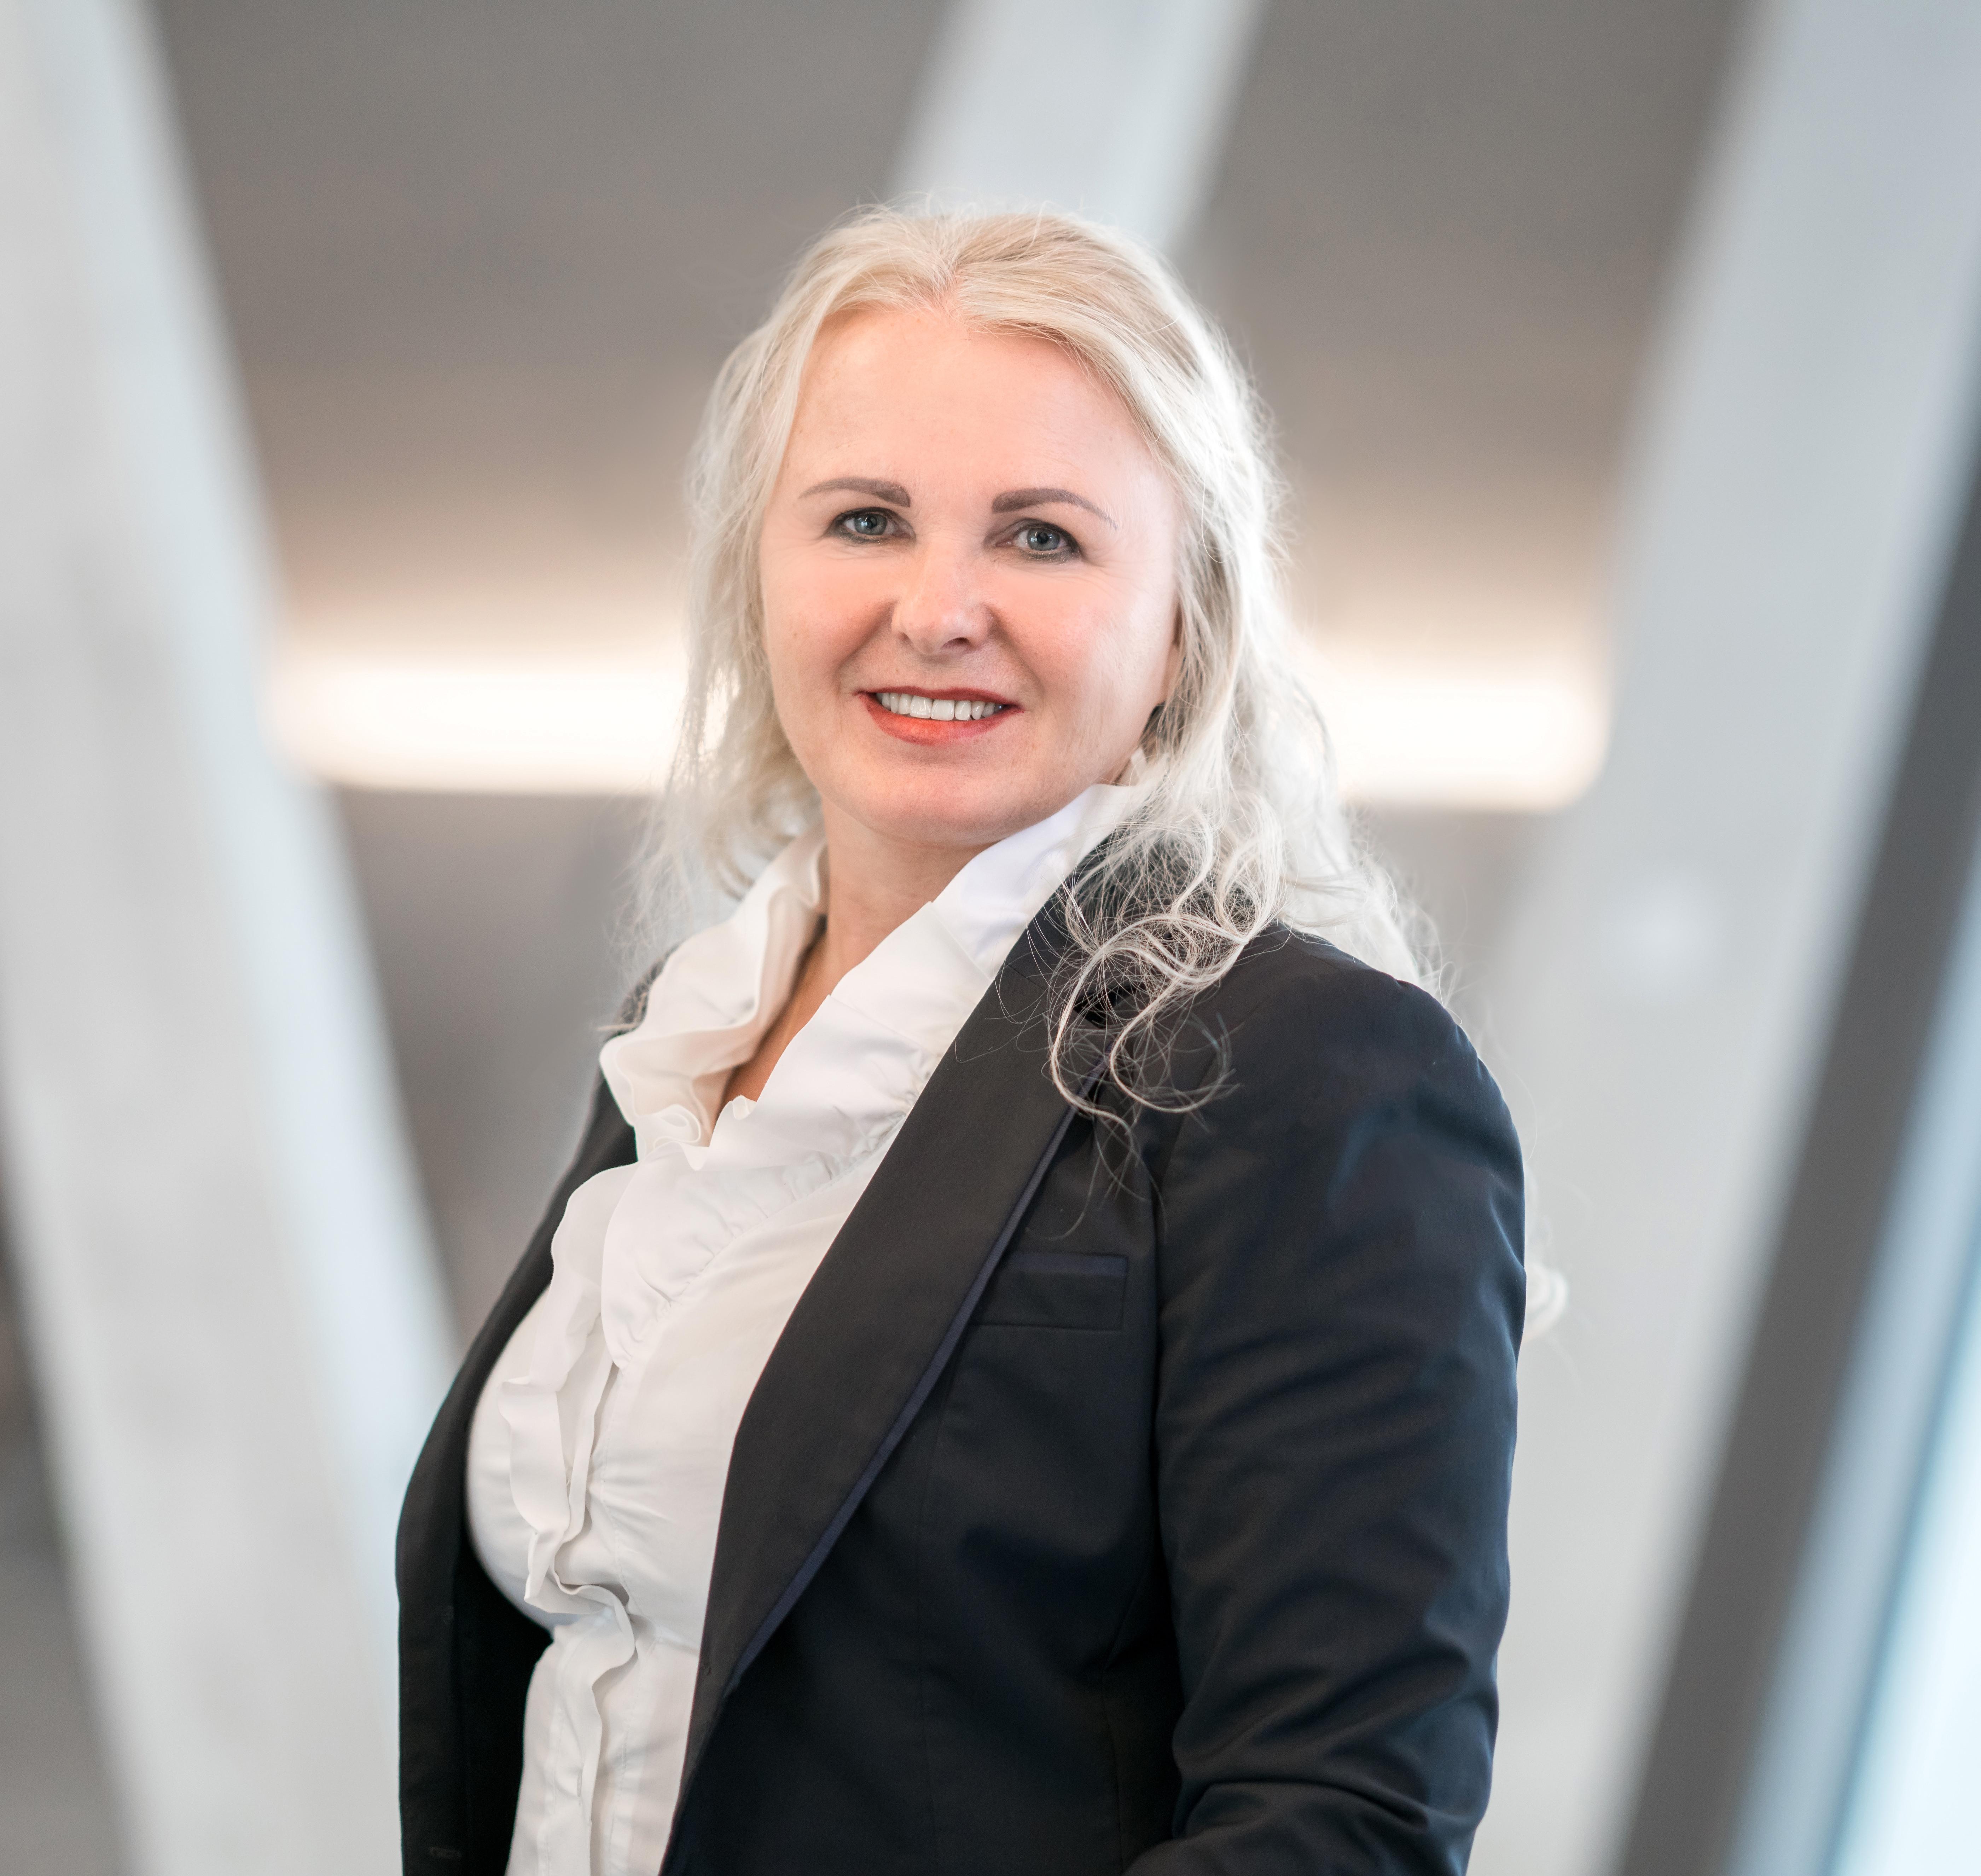 Brigitte Obermüller